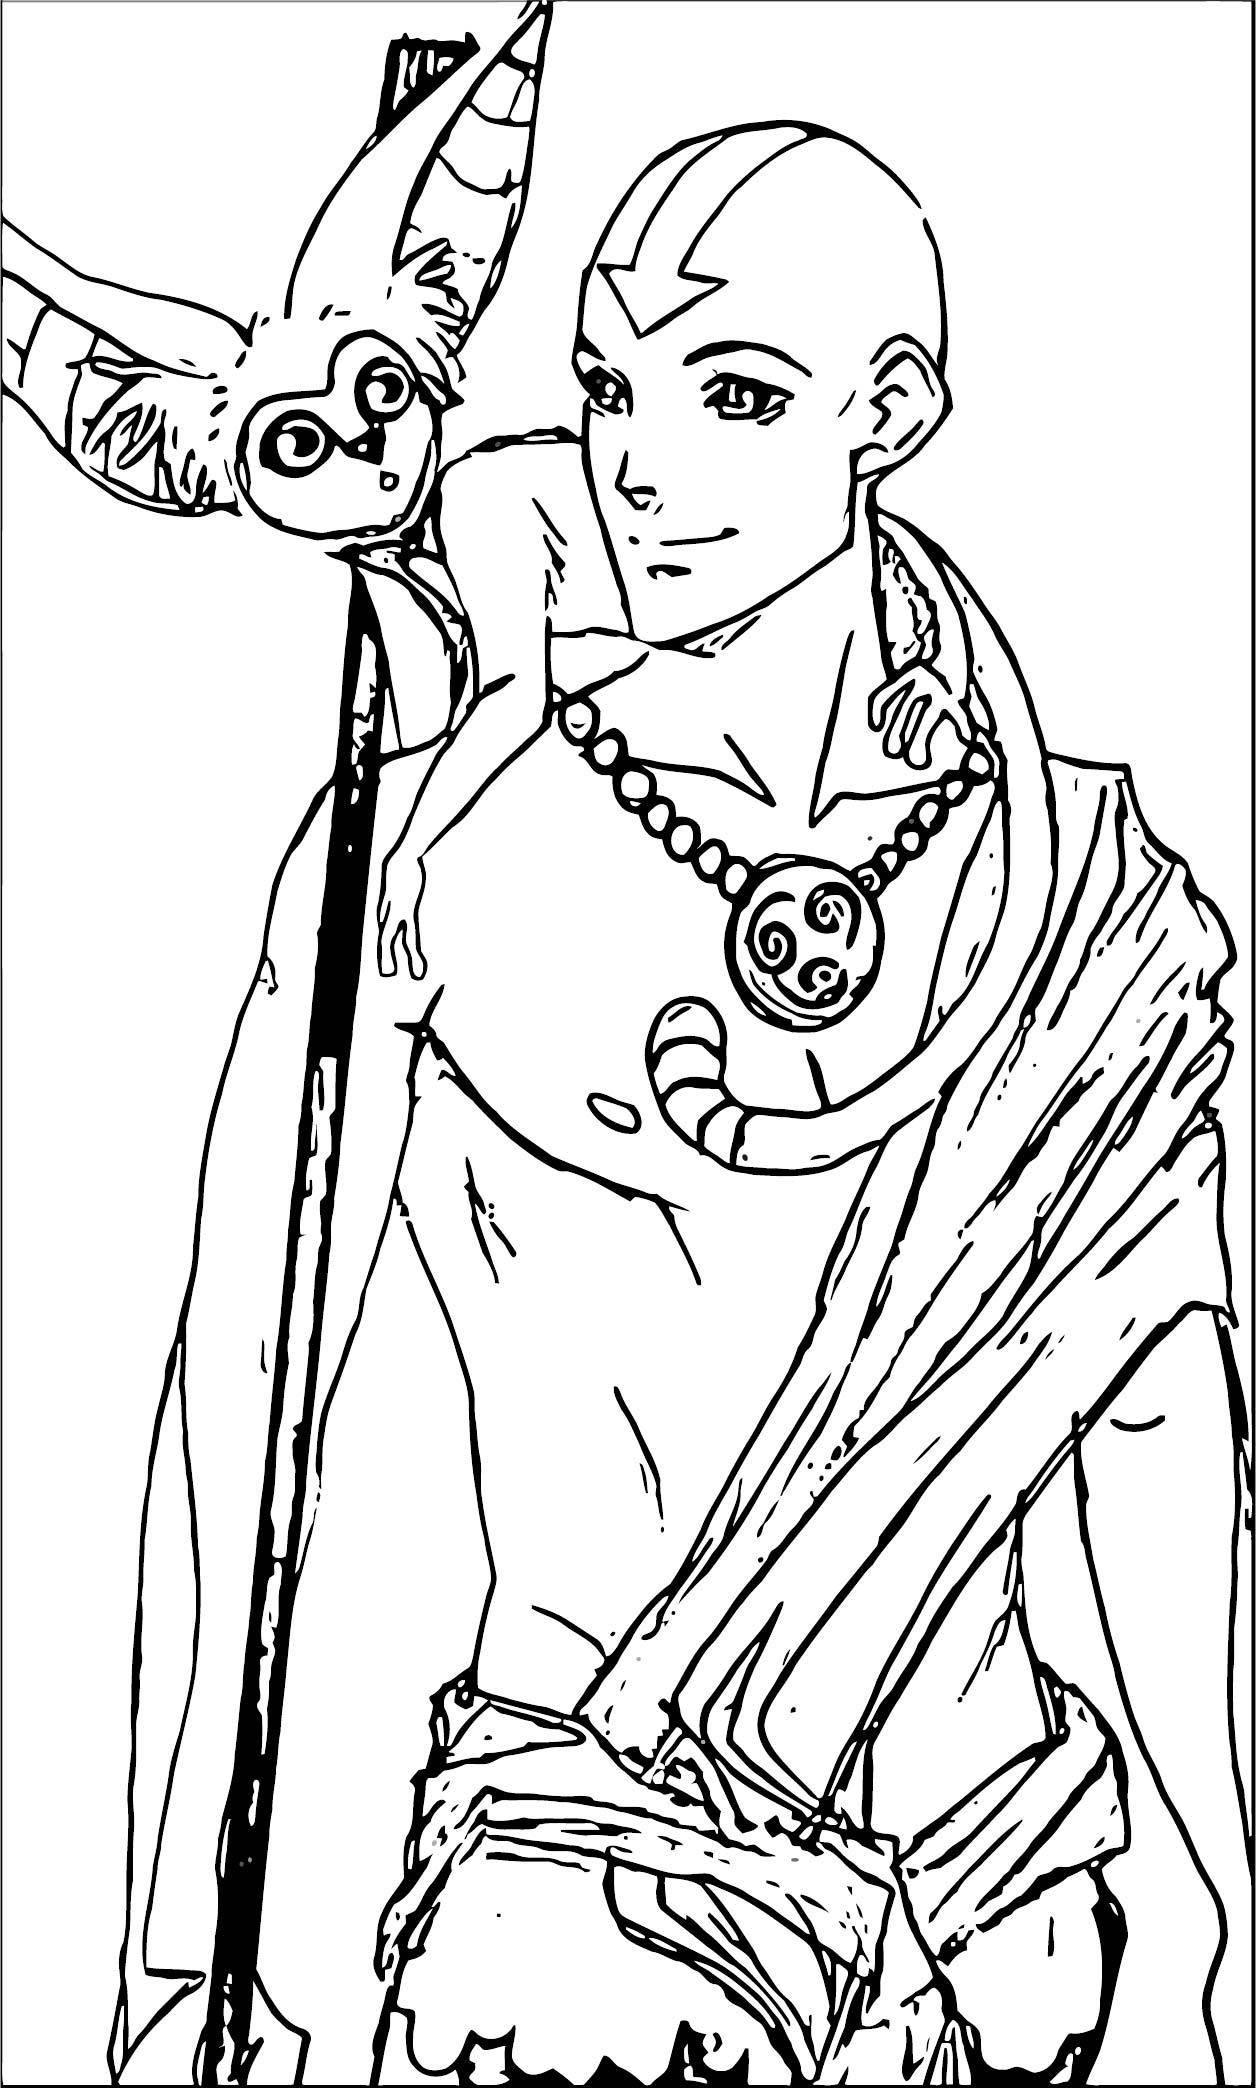 Dececbbcecfecbd Avatar Aang Coloring Page